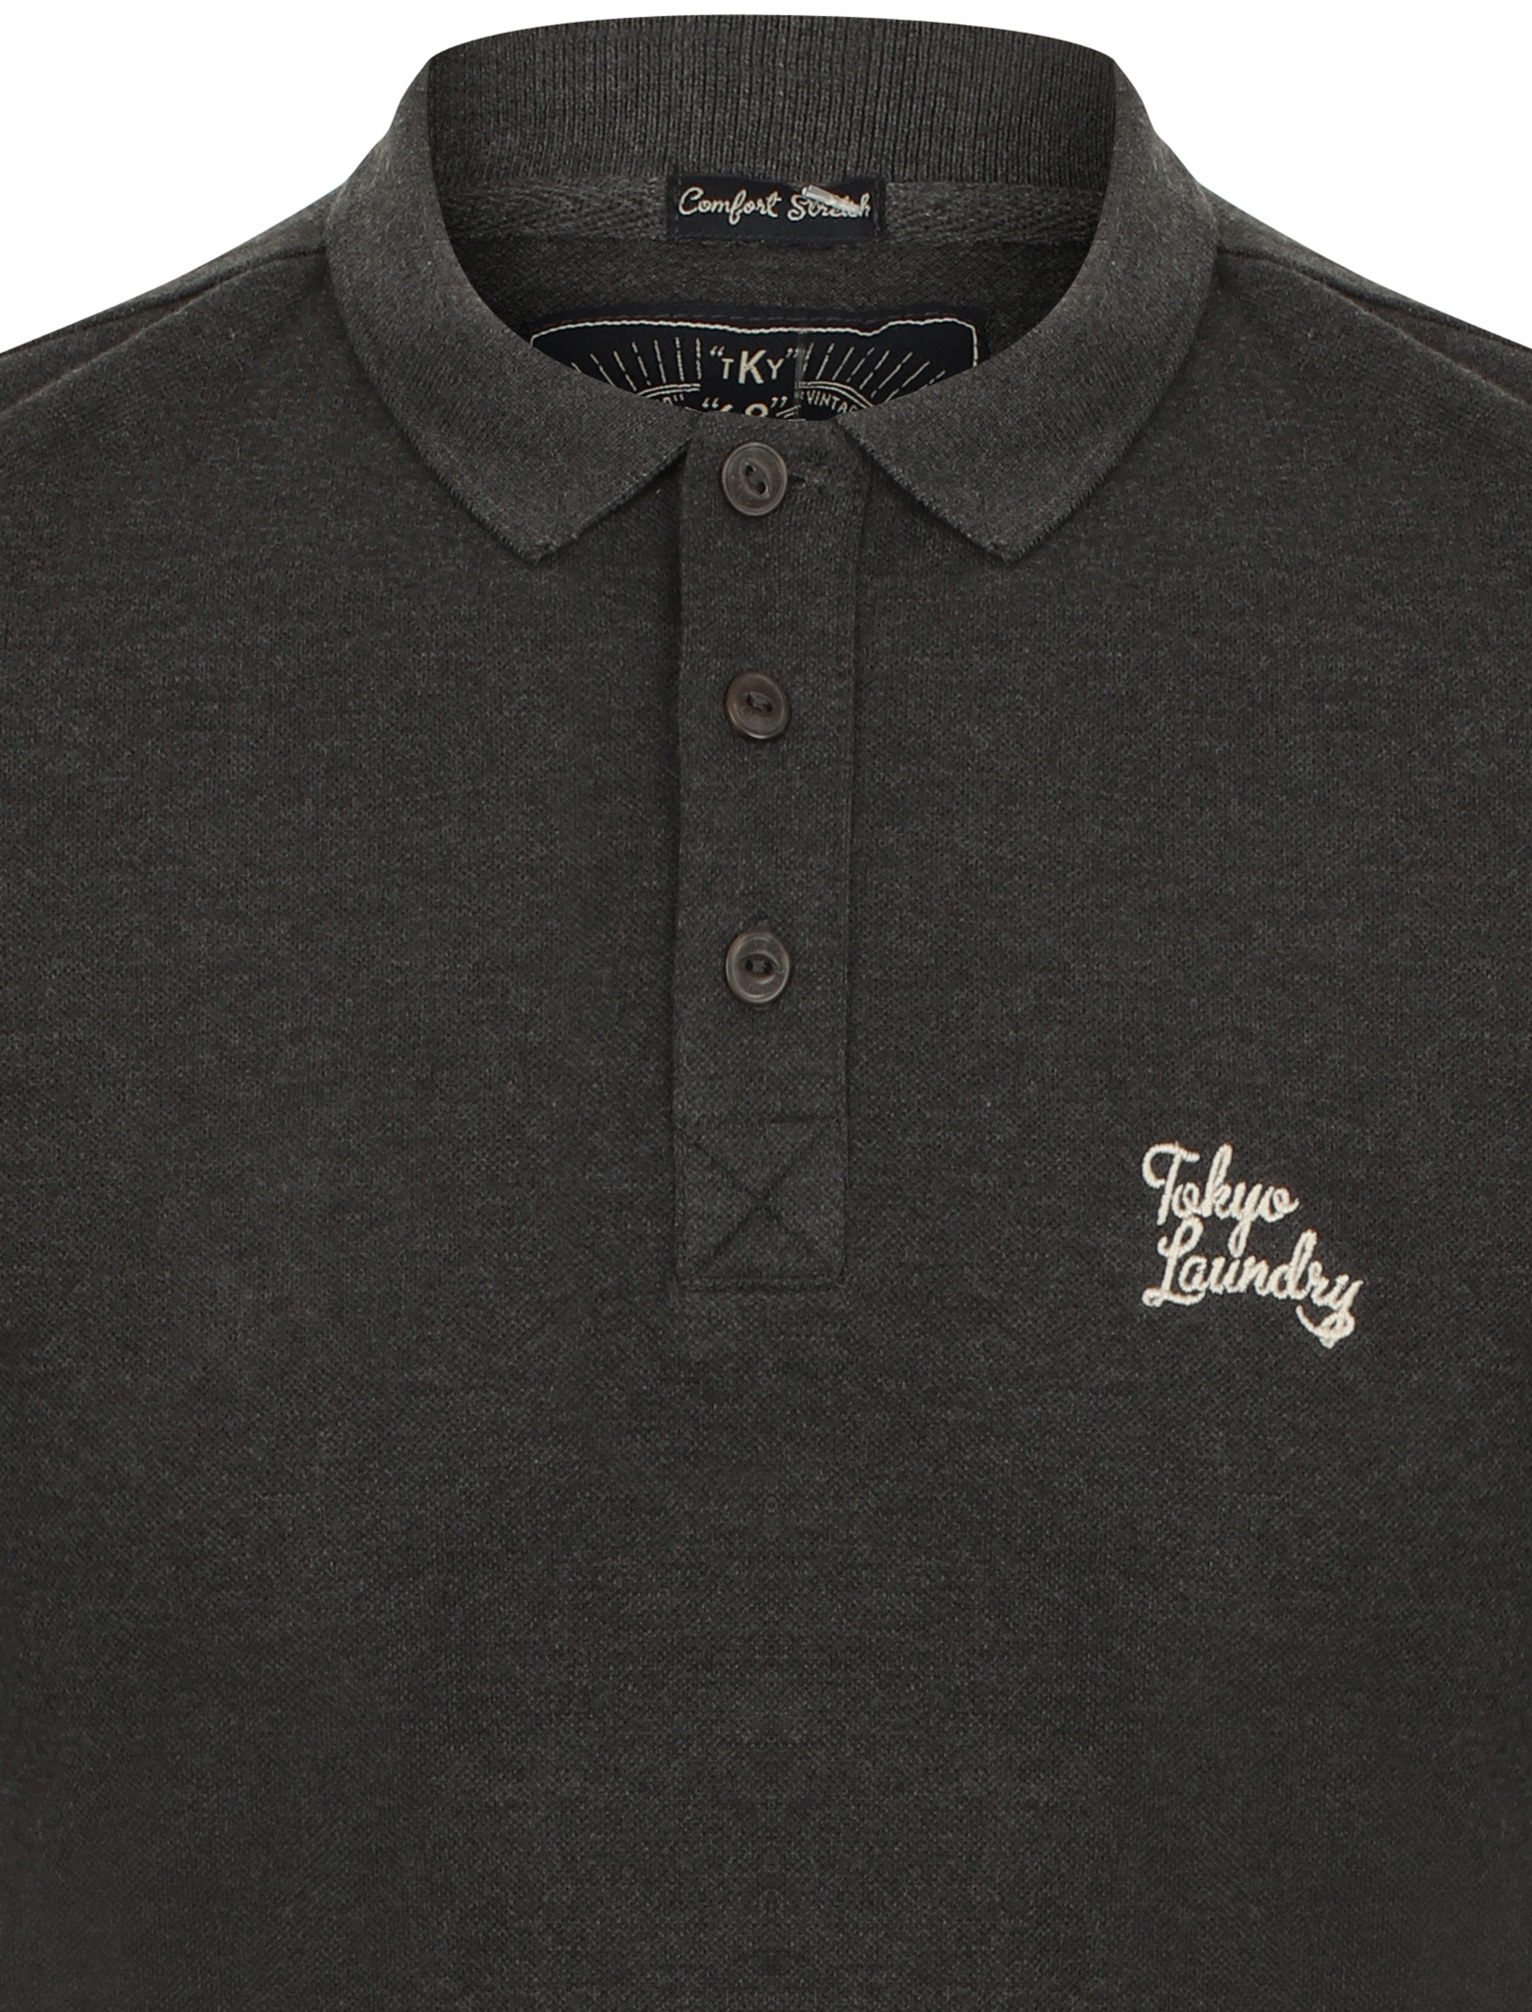 New-Mens-Tokyo-Laundry-Branded-Kuusamo-Cotton-Rich-Pique-Polo-Shirt-Size-S-XXL thumbnail 17